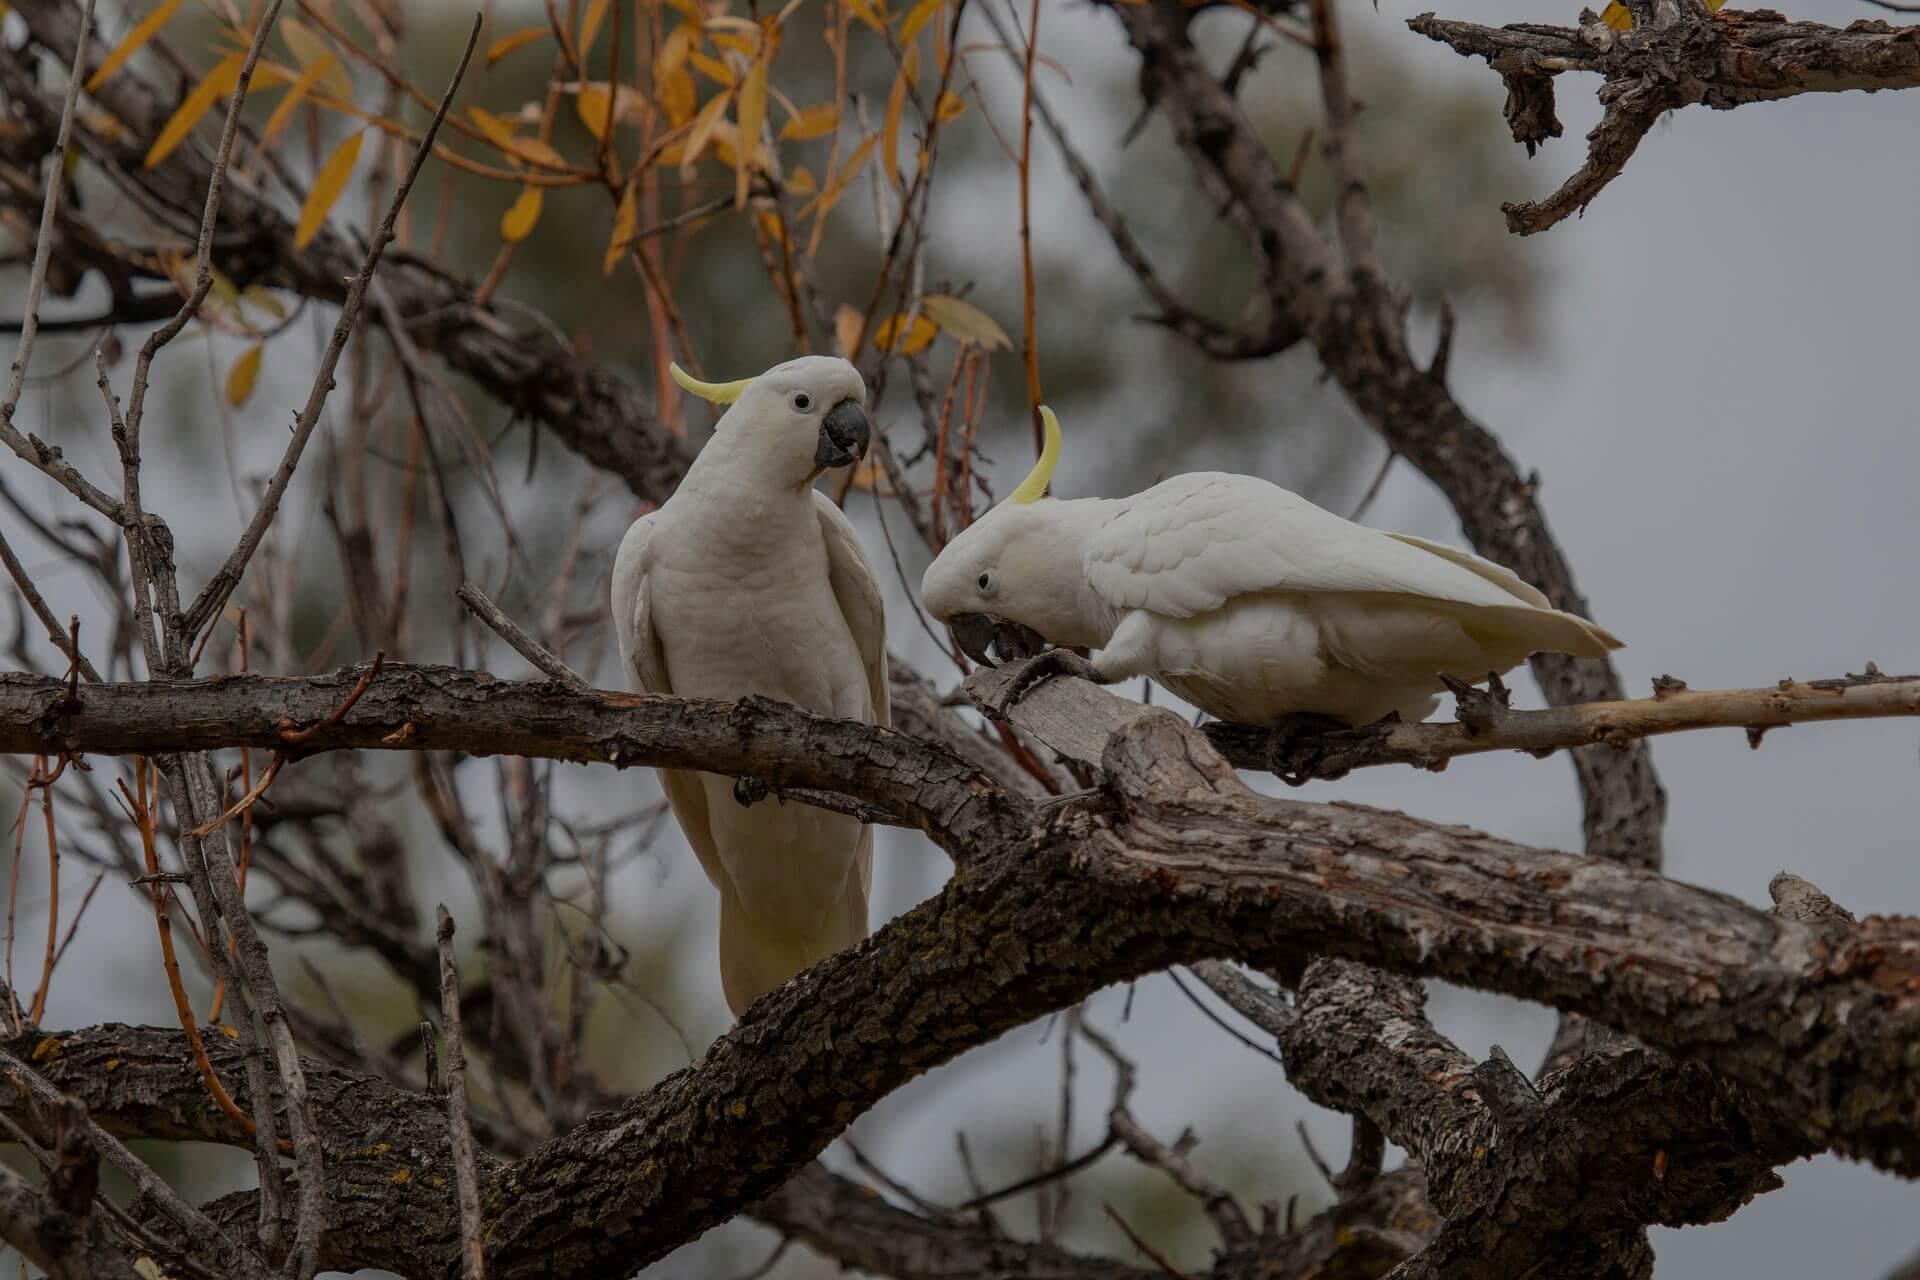 A pair of cockatoos